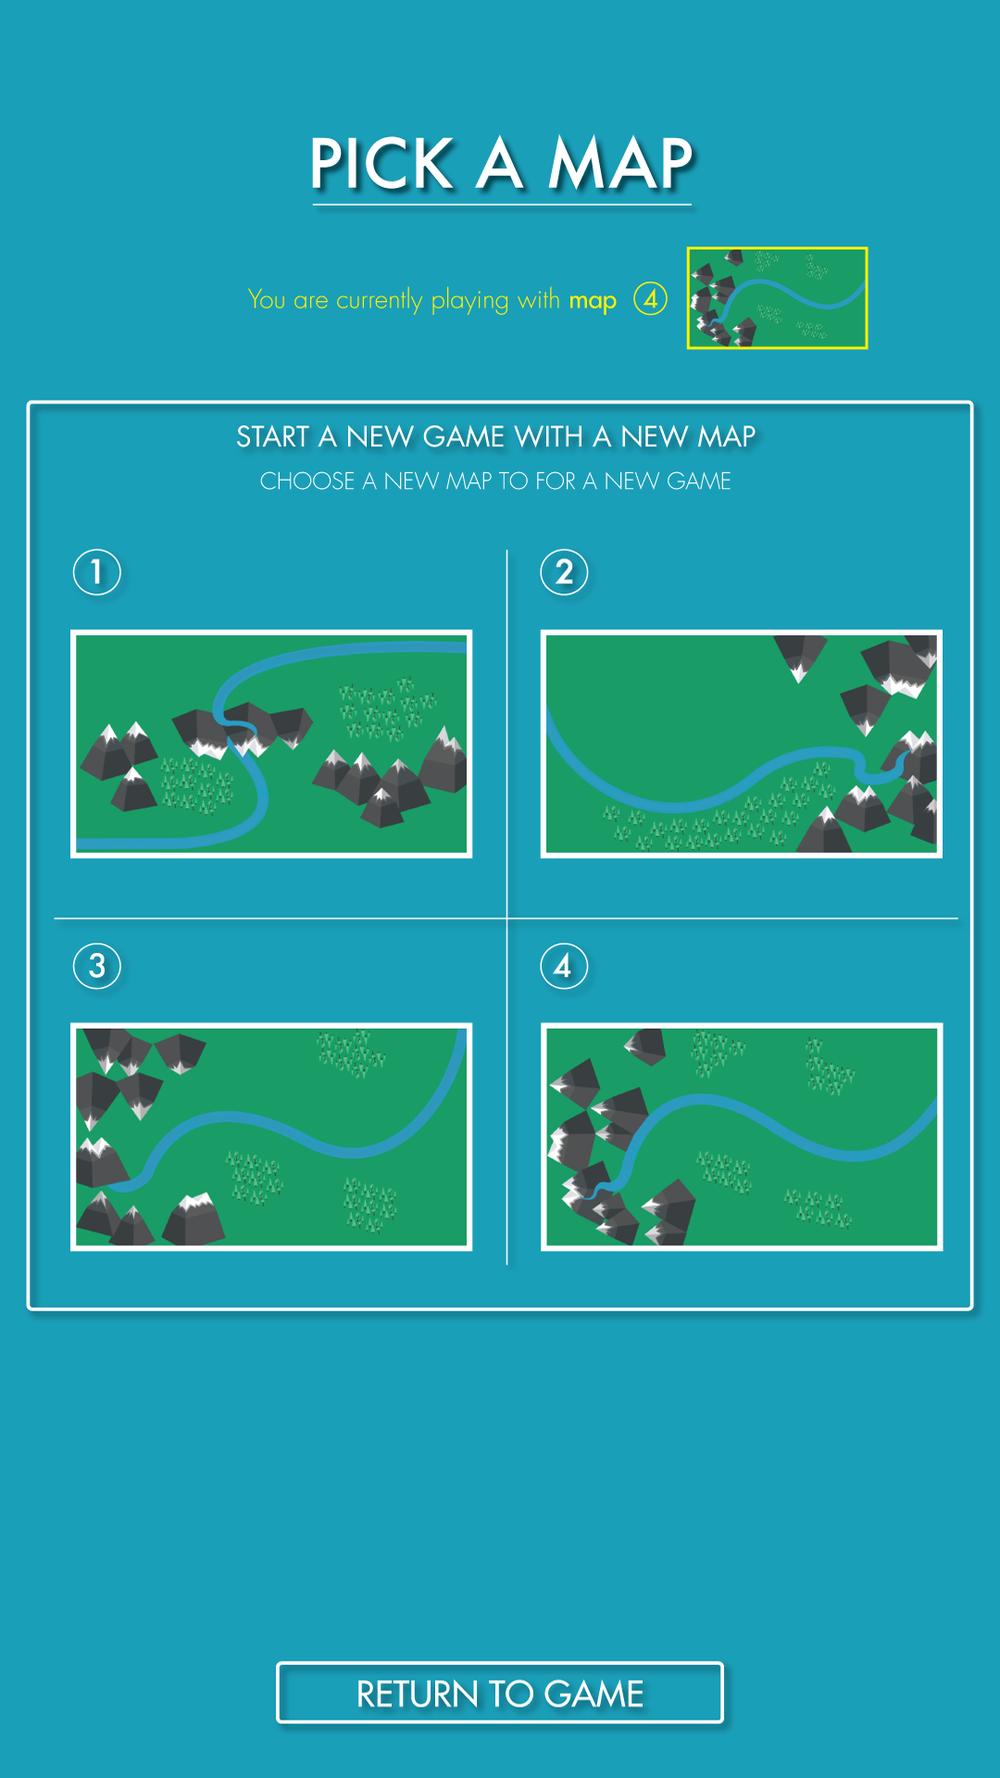 menubar_map4_1080x1920.png